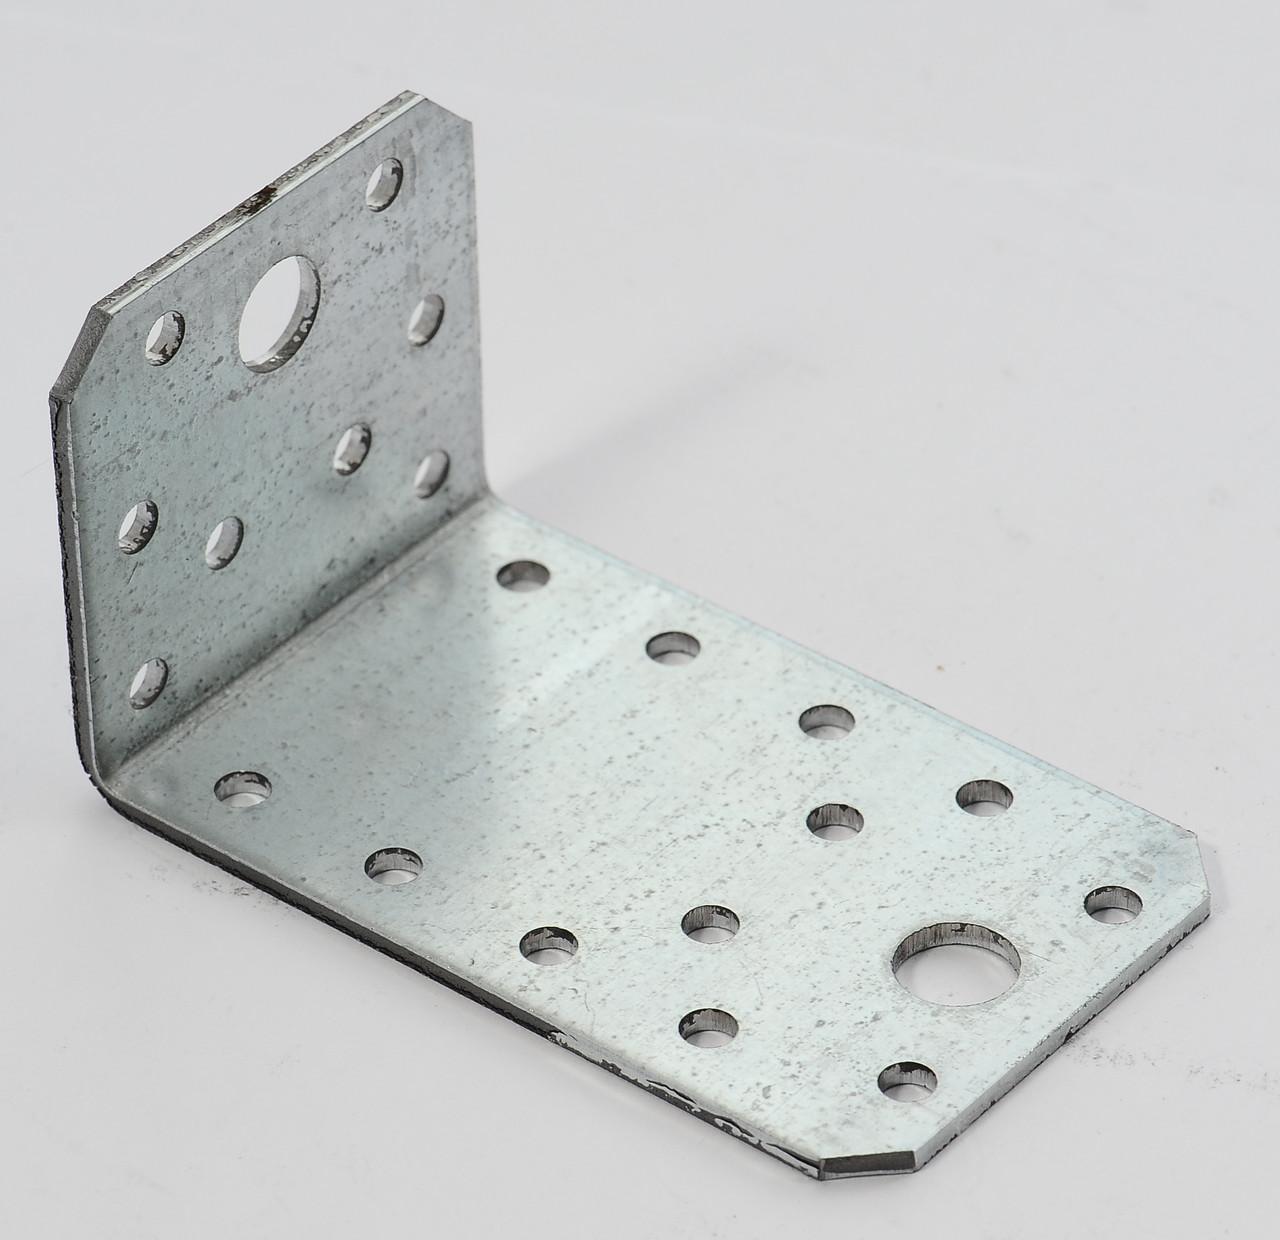 Уголок универсальный 90х50х55 х 1,8 мм